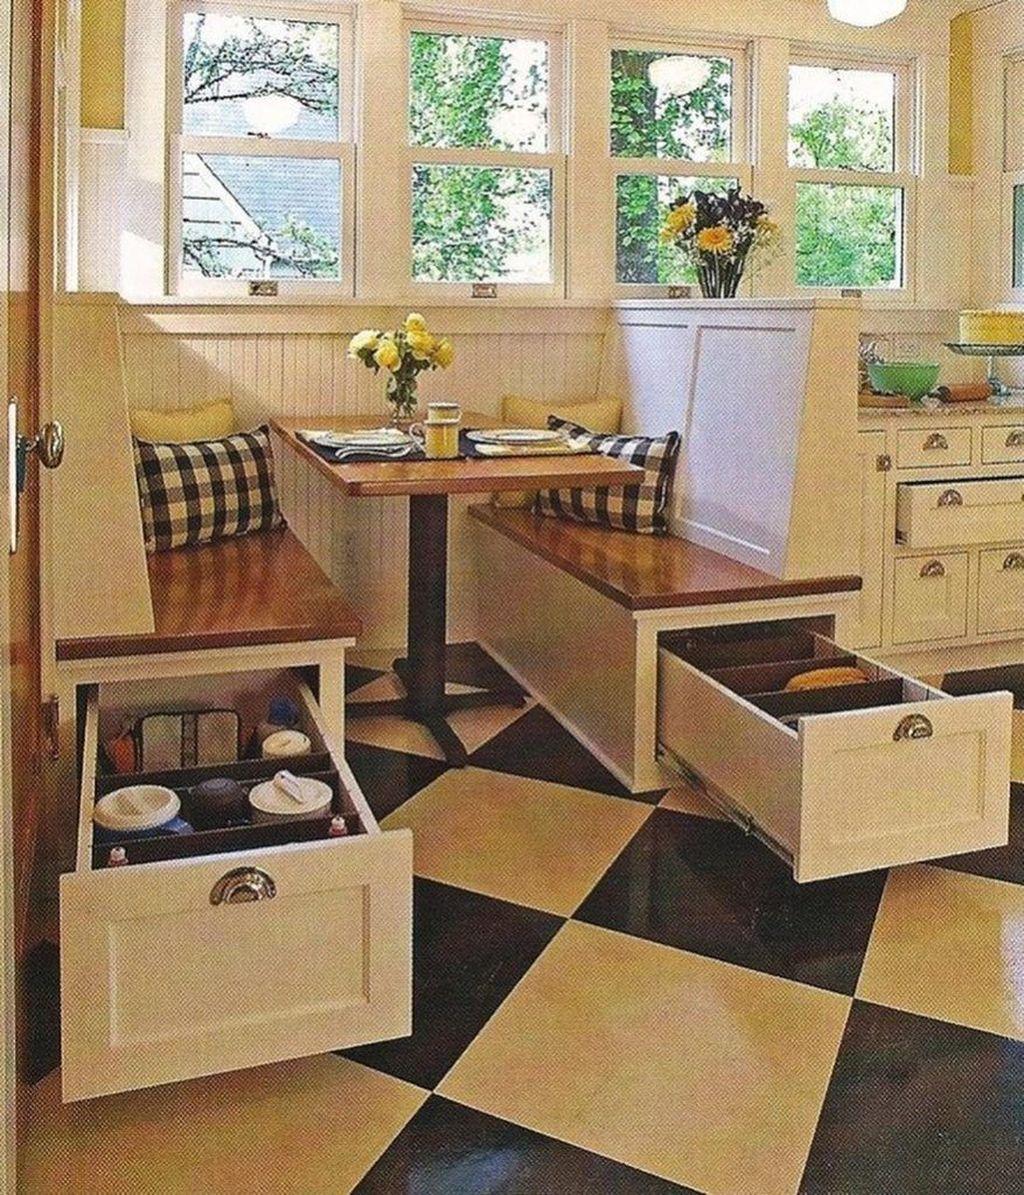 Inspiring RV Kitchen Design And Decor Ideas 21